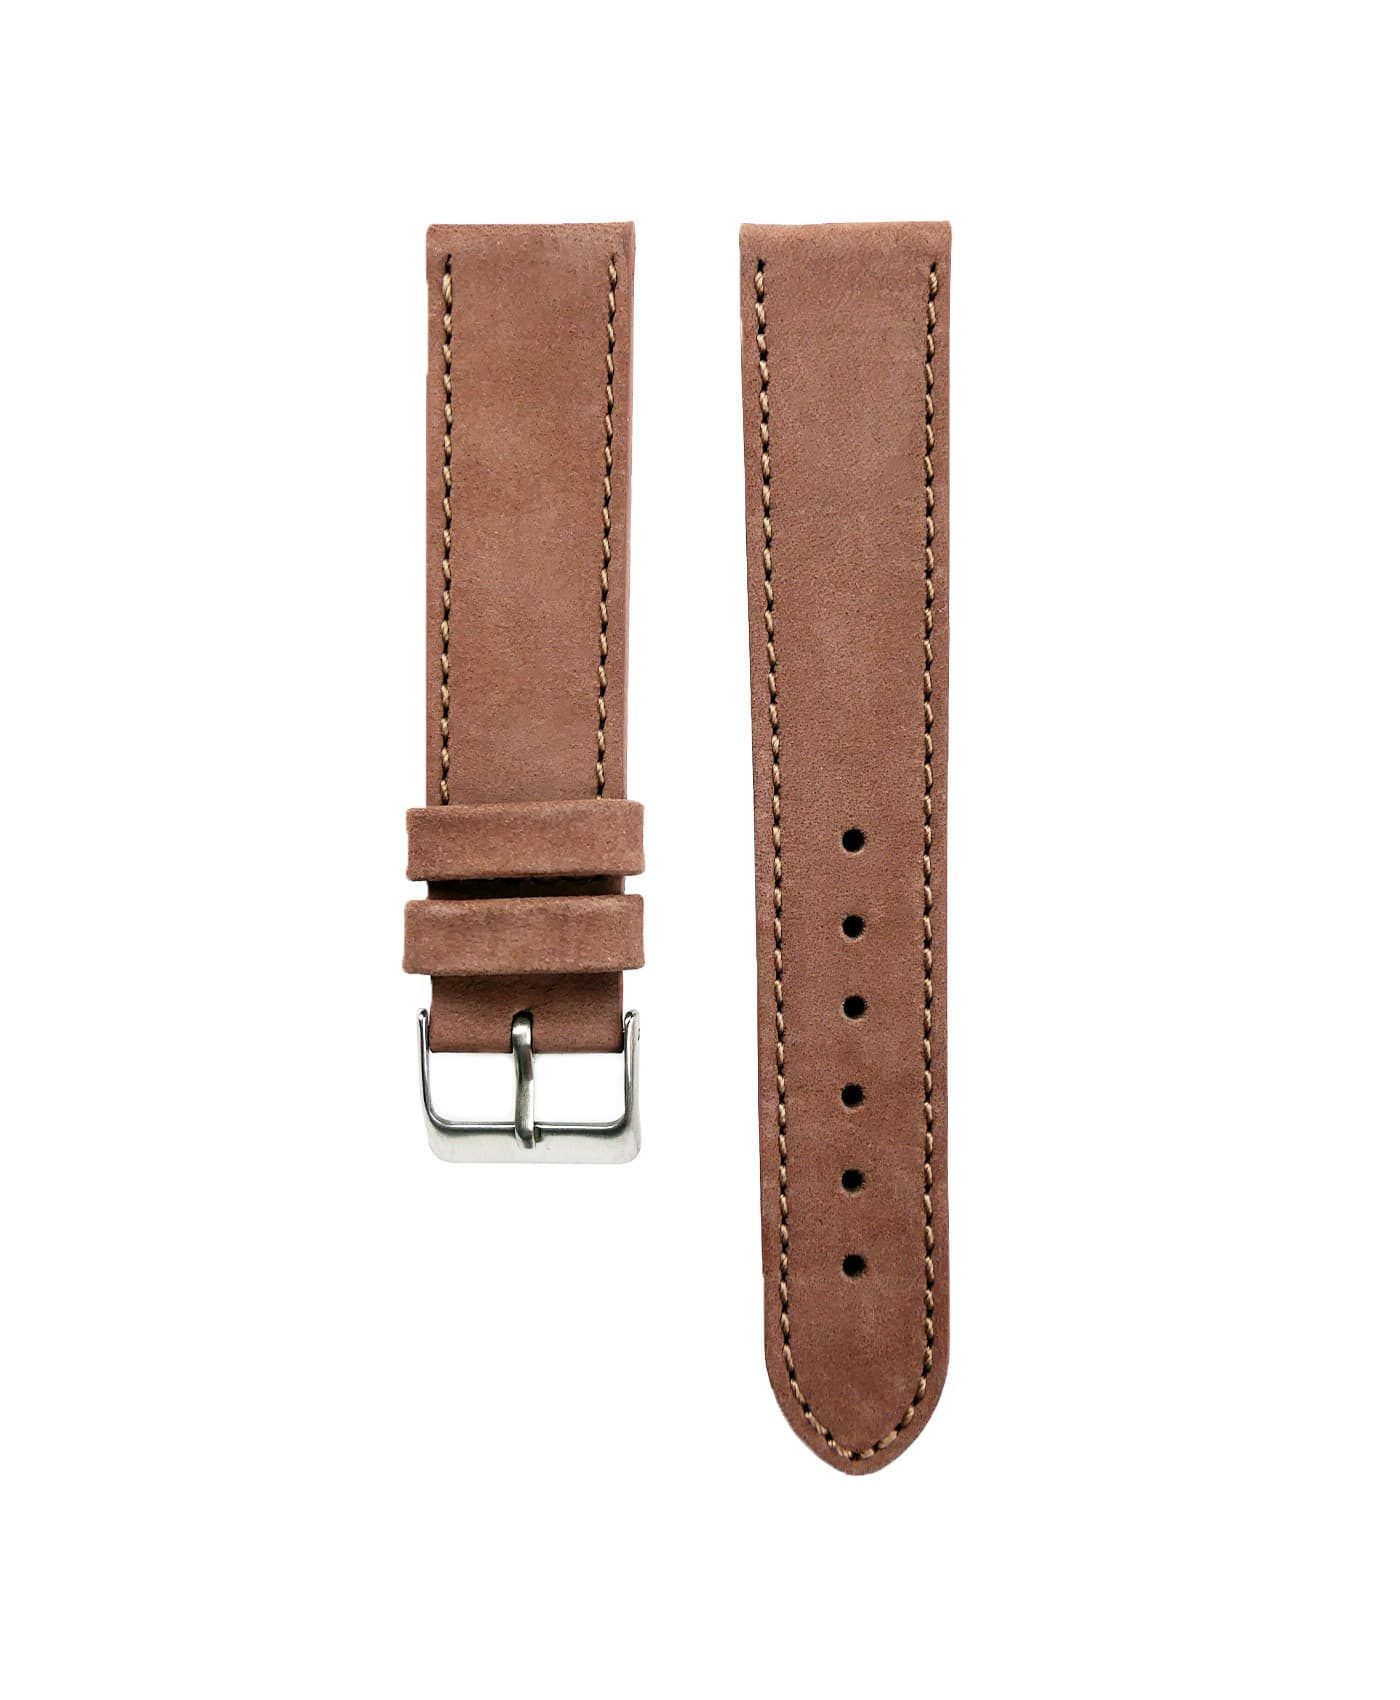 Pebro_classic_suede-straps_hazelnut-front